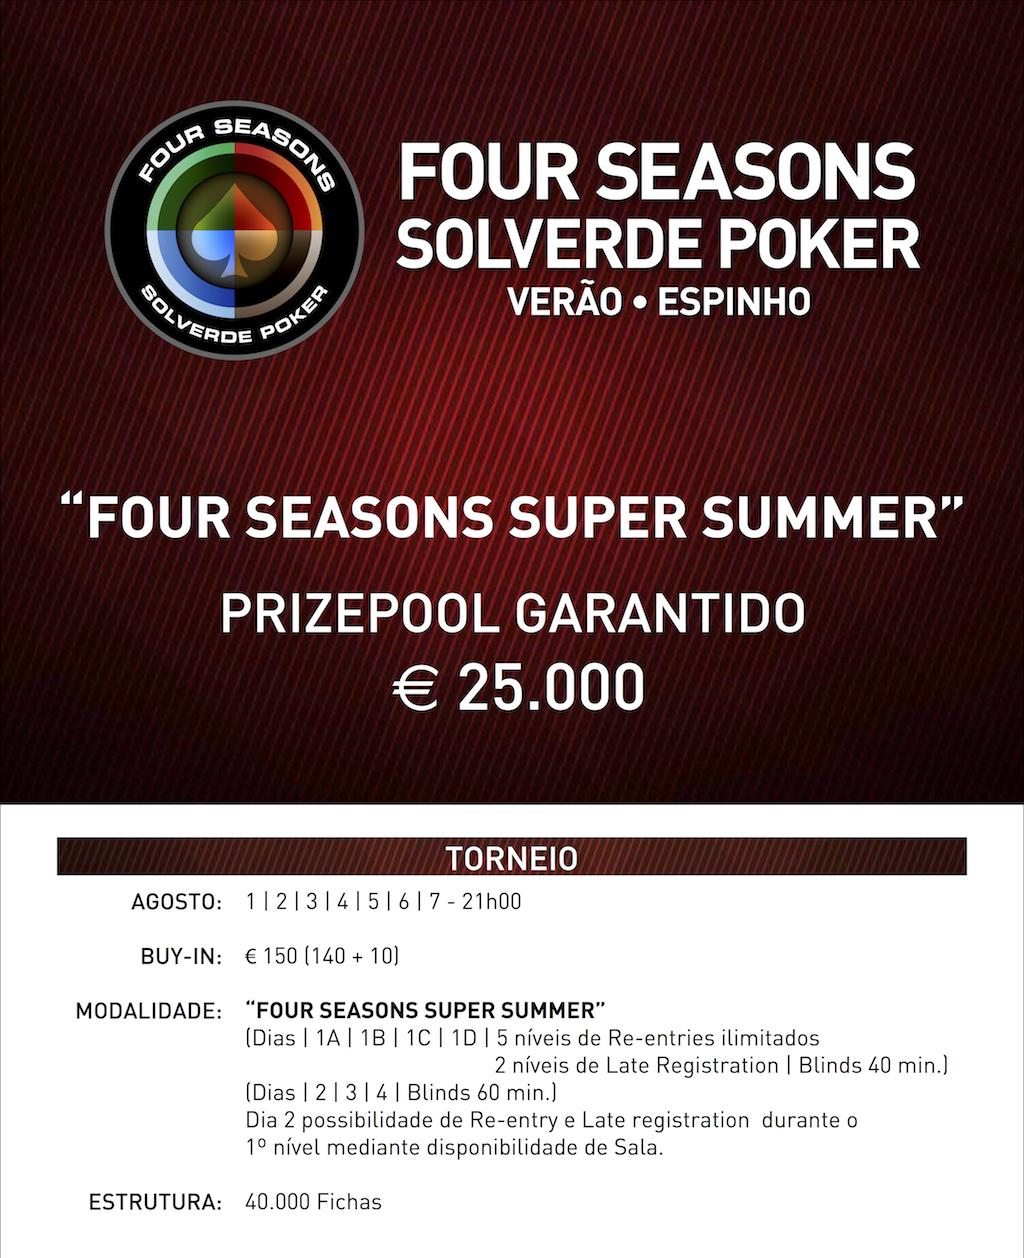 Manuel Miranda Comandou no Dia 1b do Four Seasons Super Summer 101